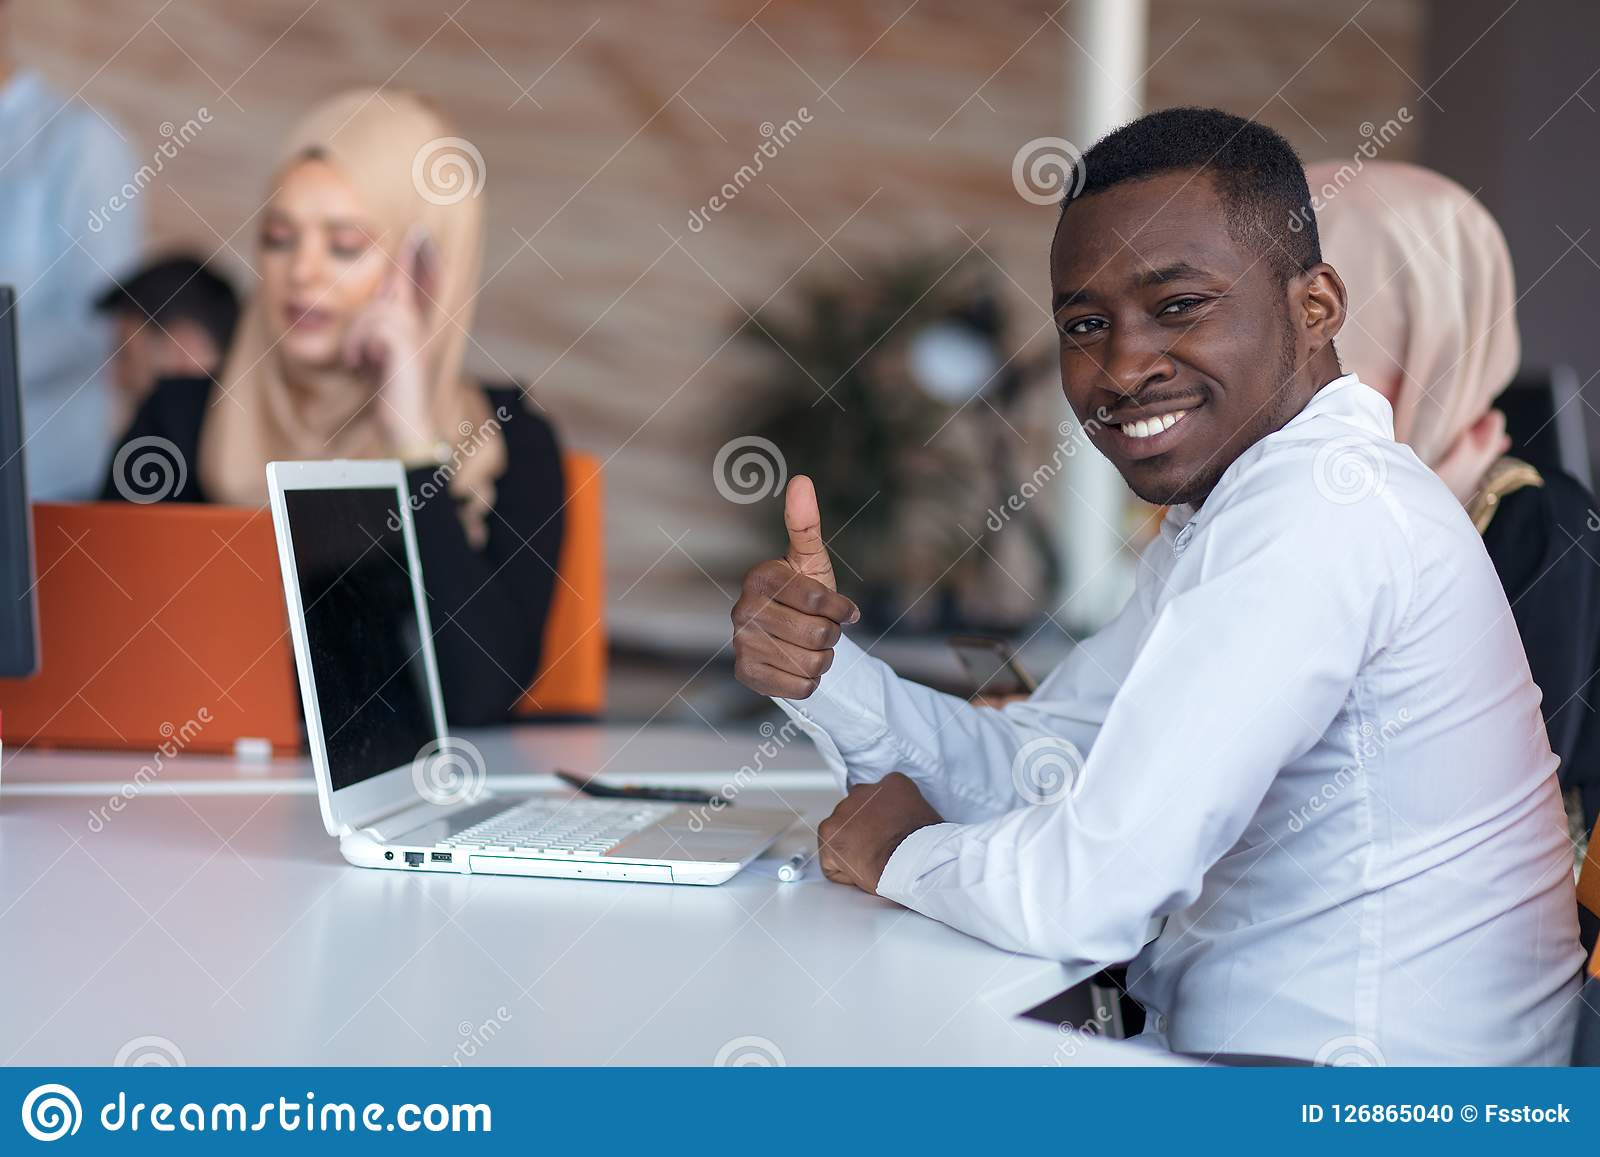 Start bedrijfsmensengroep die dagelijkse baan werken op modern kantoor Technologie-bureau, technologie-bedrijf, technologie-opsta